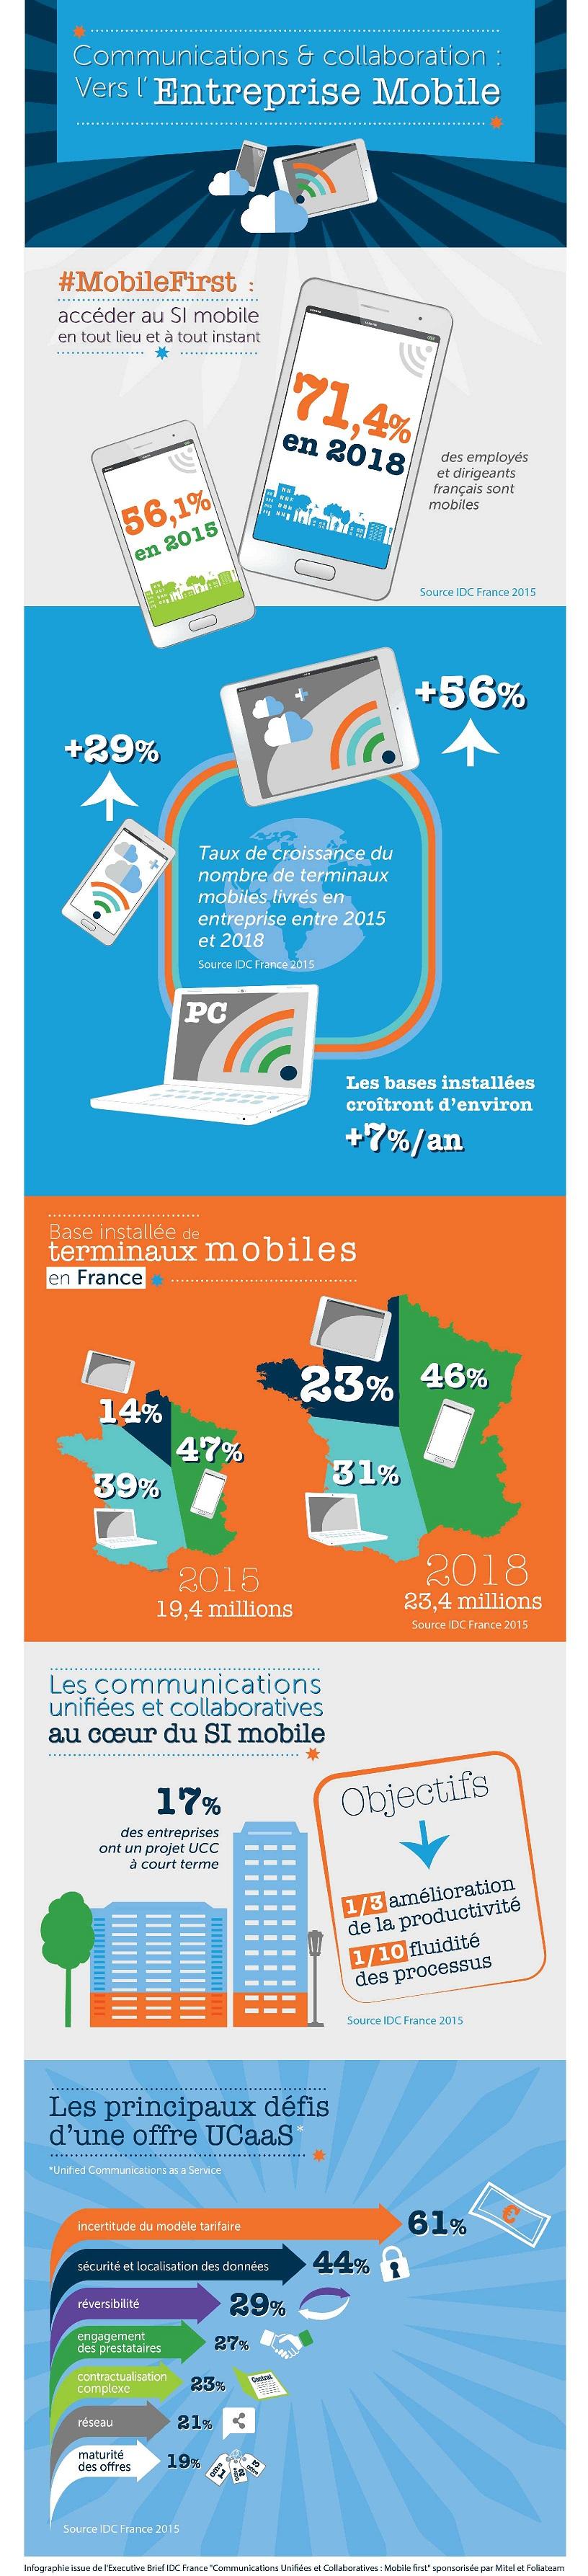 entreprises-mobile-first